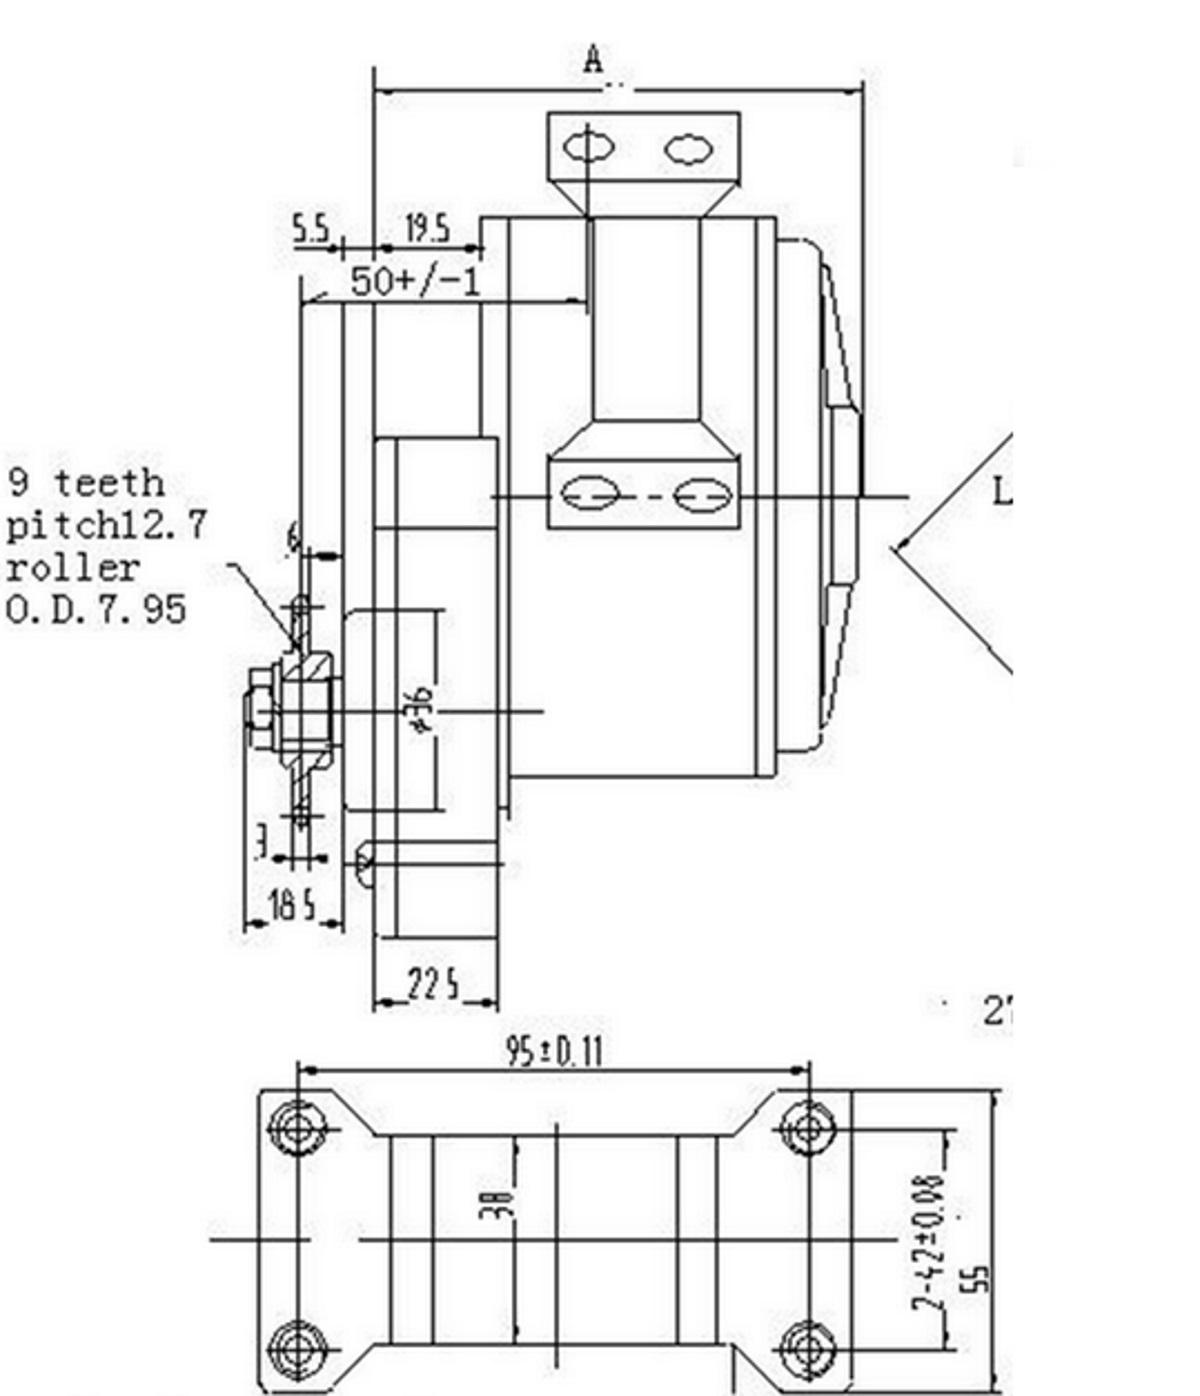 91 ezgo marathon wiring diagram 1973 dodge charger seat belt 4 drive electric carts and fuse box